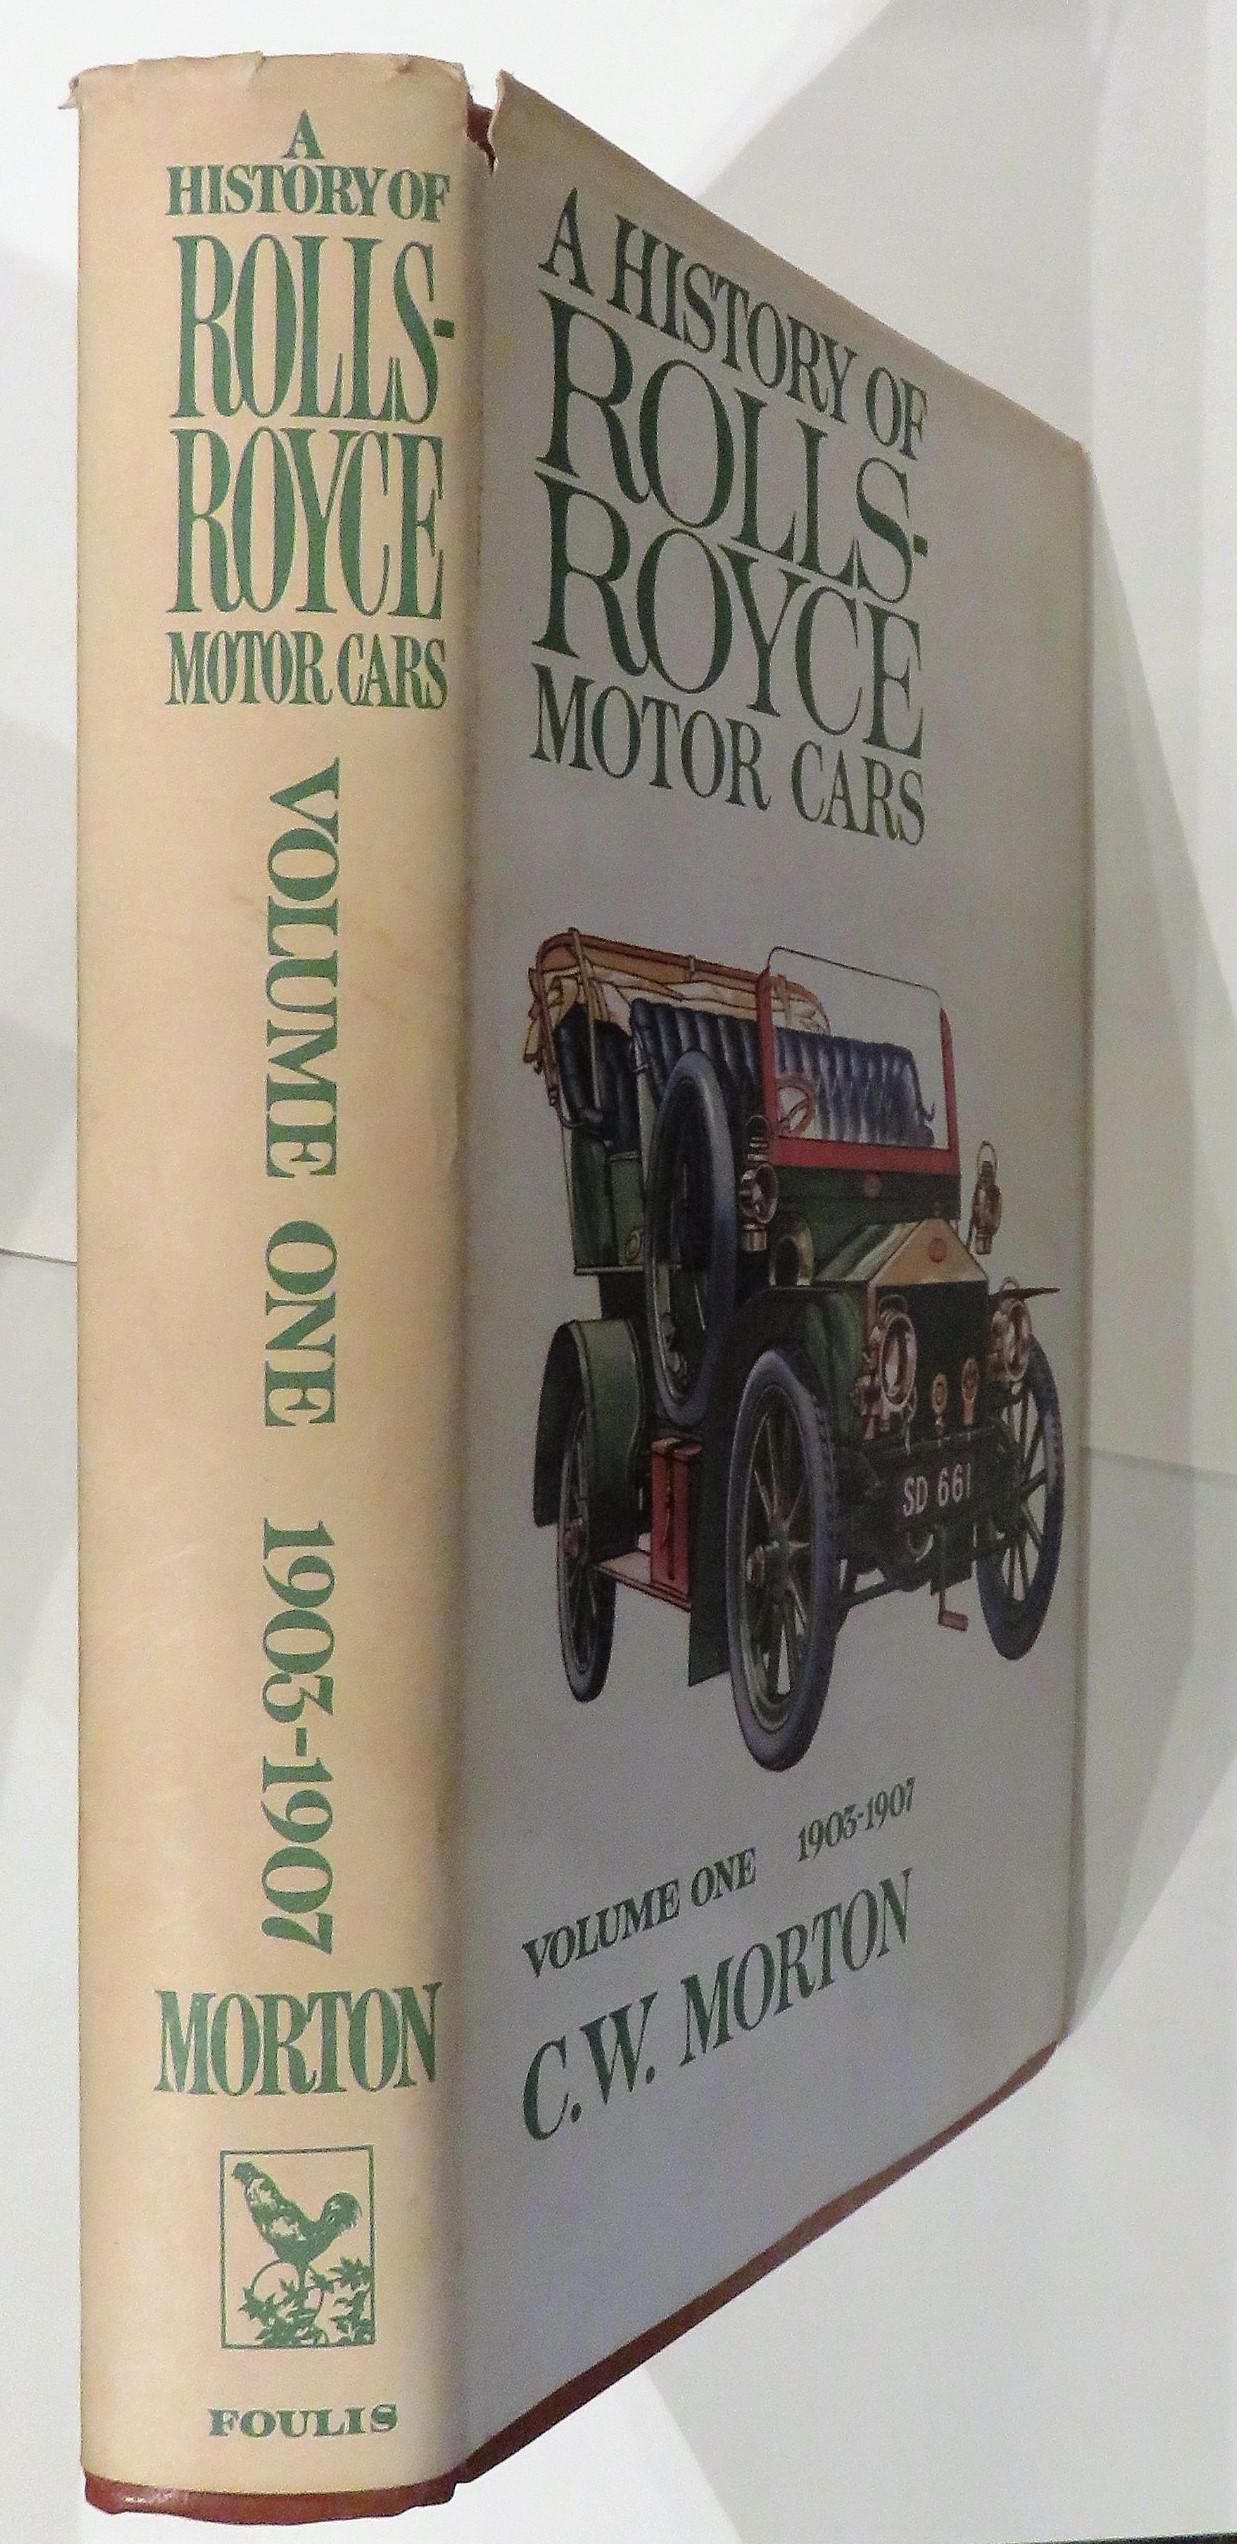 A History of Rolls-Royce Motor Cars Volume I 1903-7